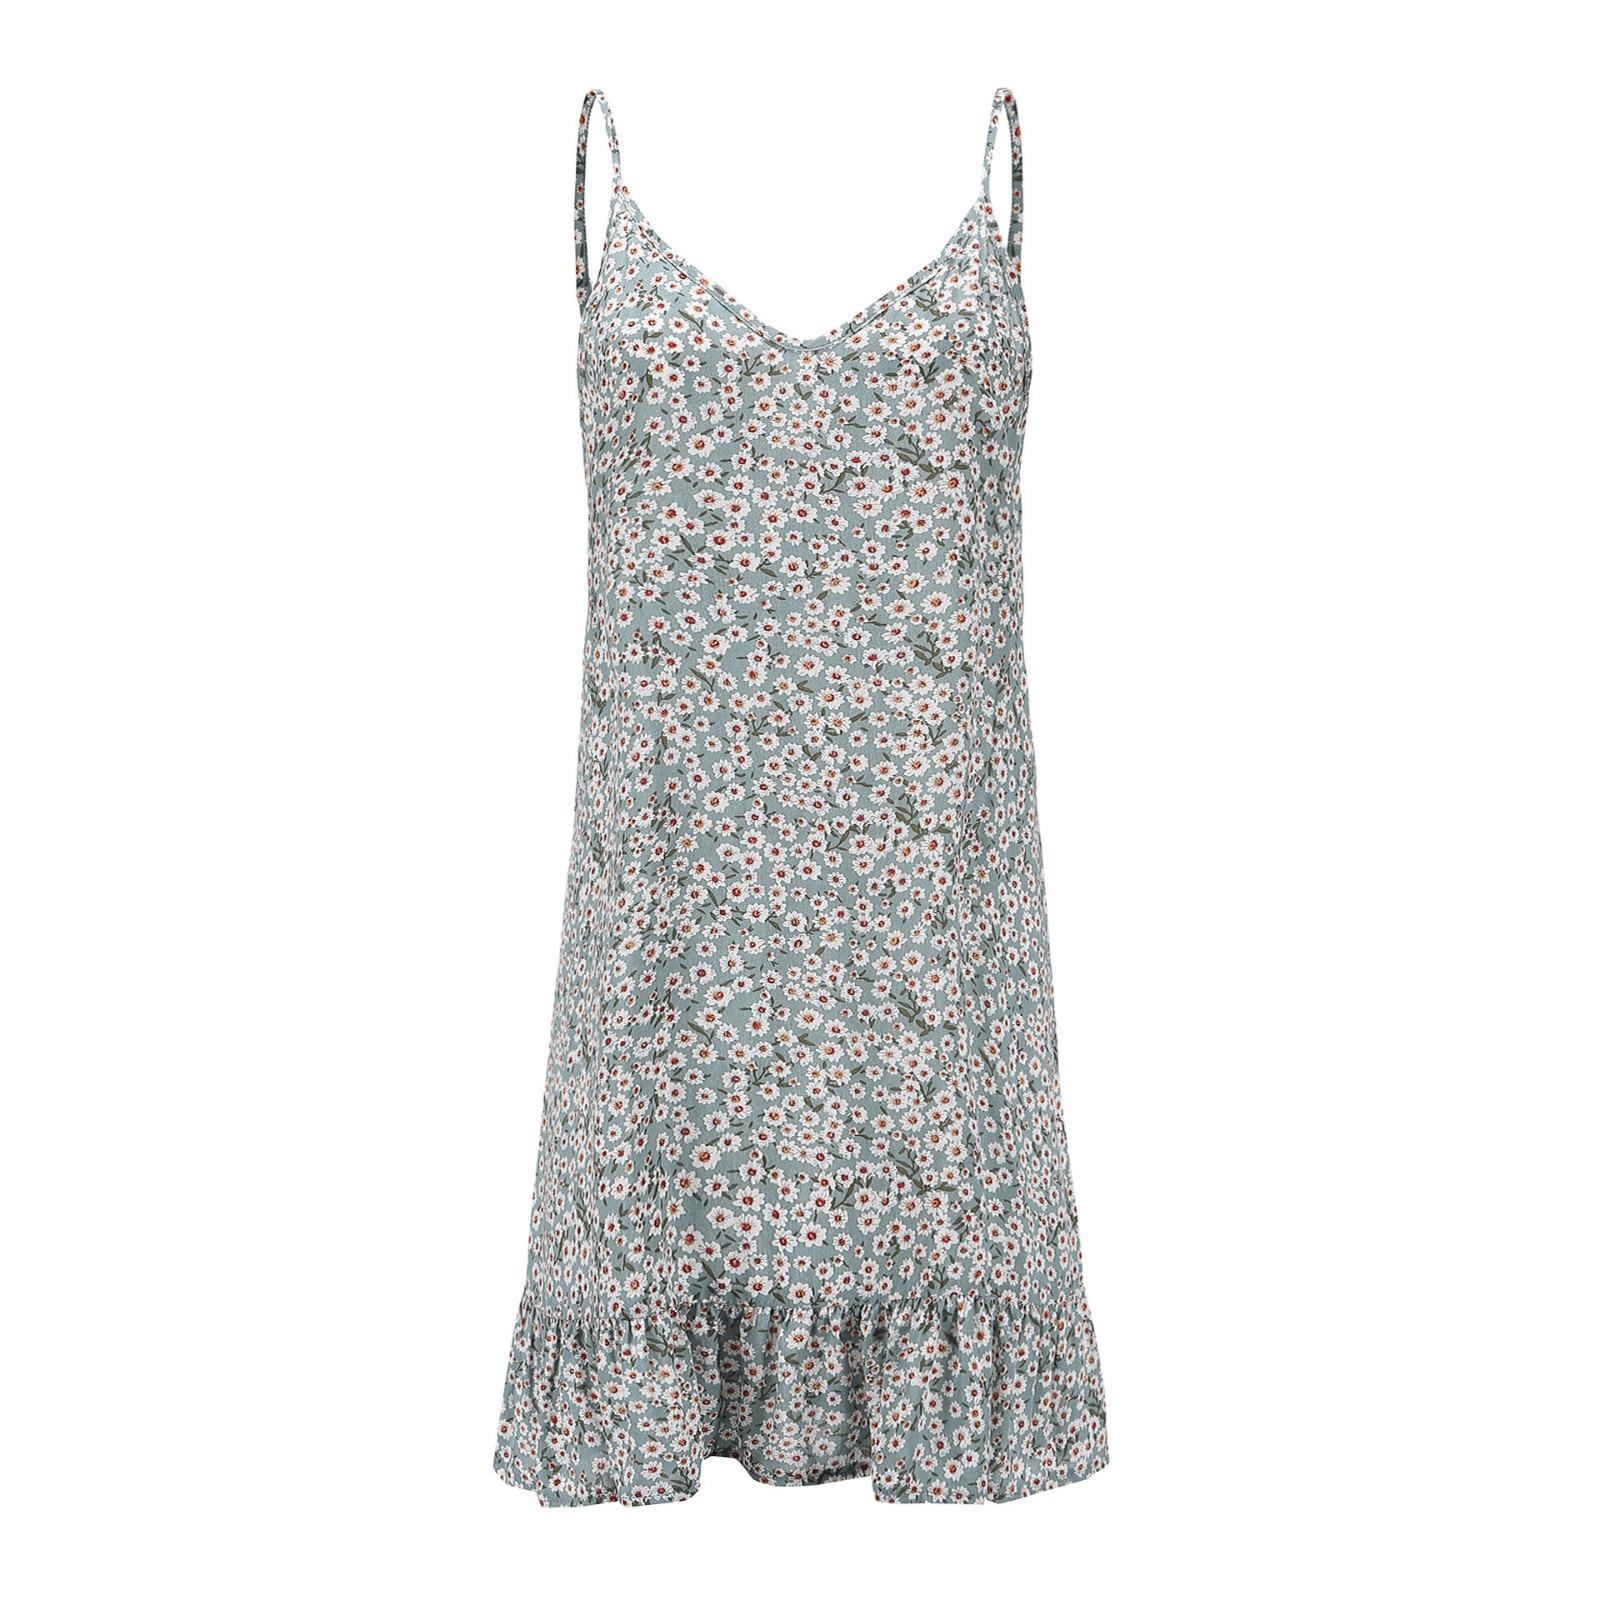 HTB1yf7QKSzqK1RjSZFHq6z3CpXaY MUQGEW floral dress women dresses summer 2019 Women's Printing Off-Shoulder short Sleeve Mini Dress Princess Dress#Y3